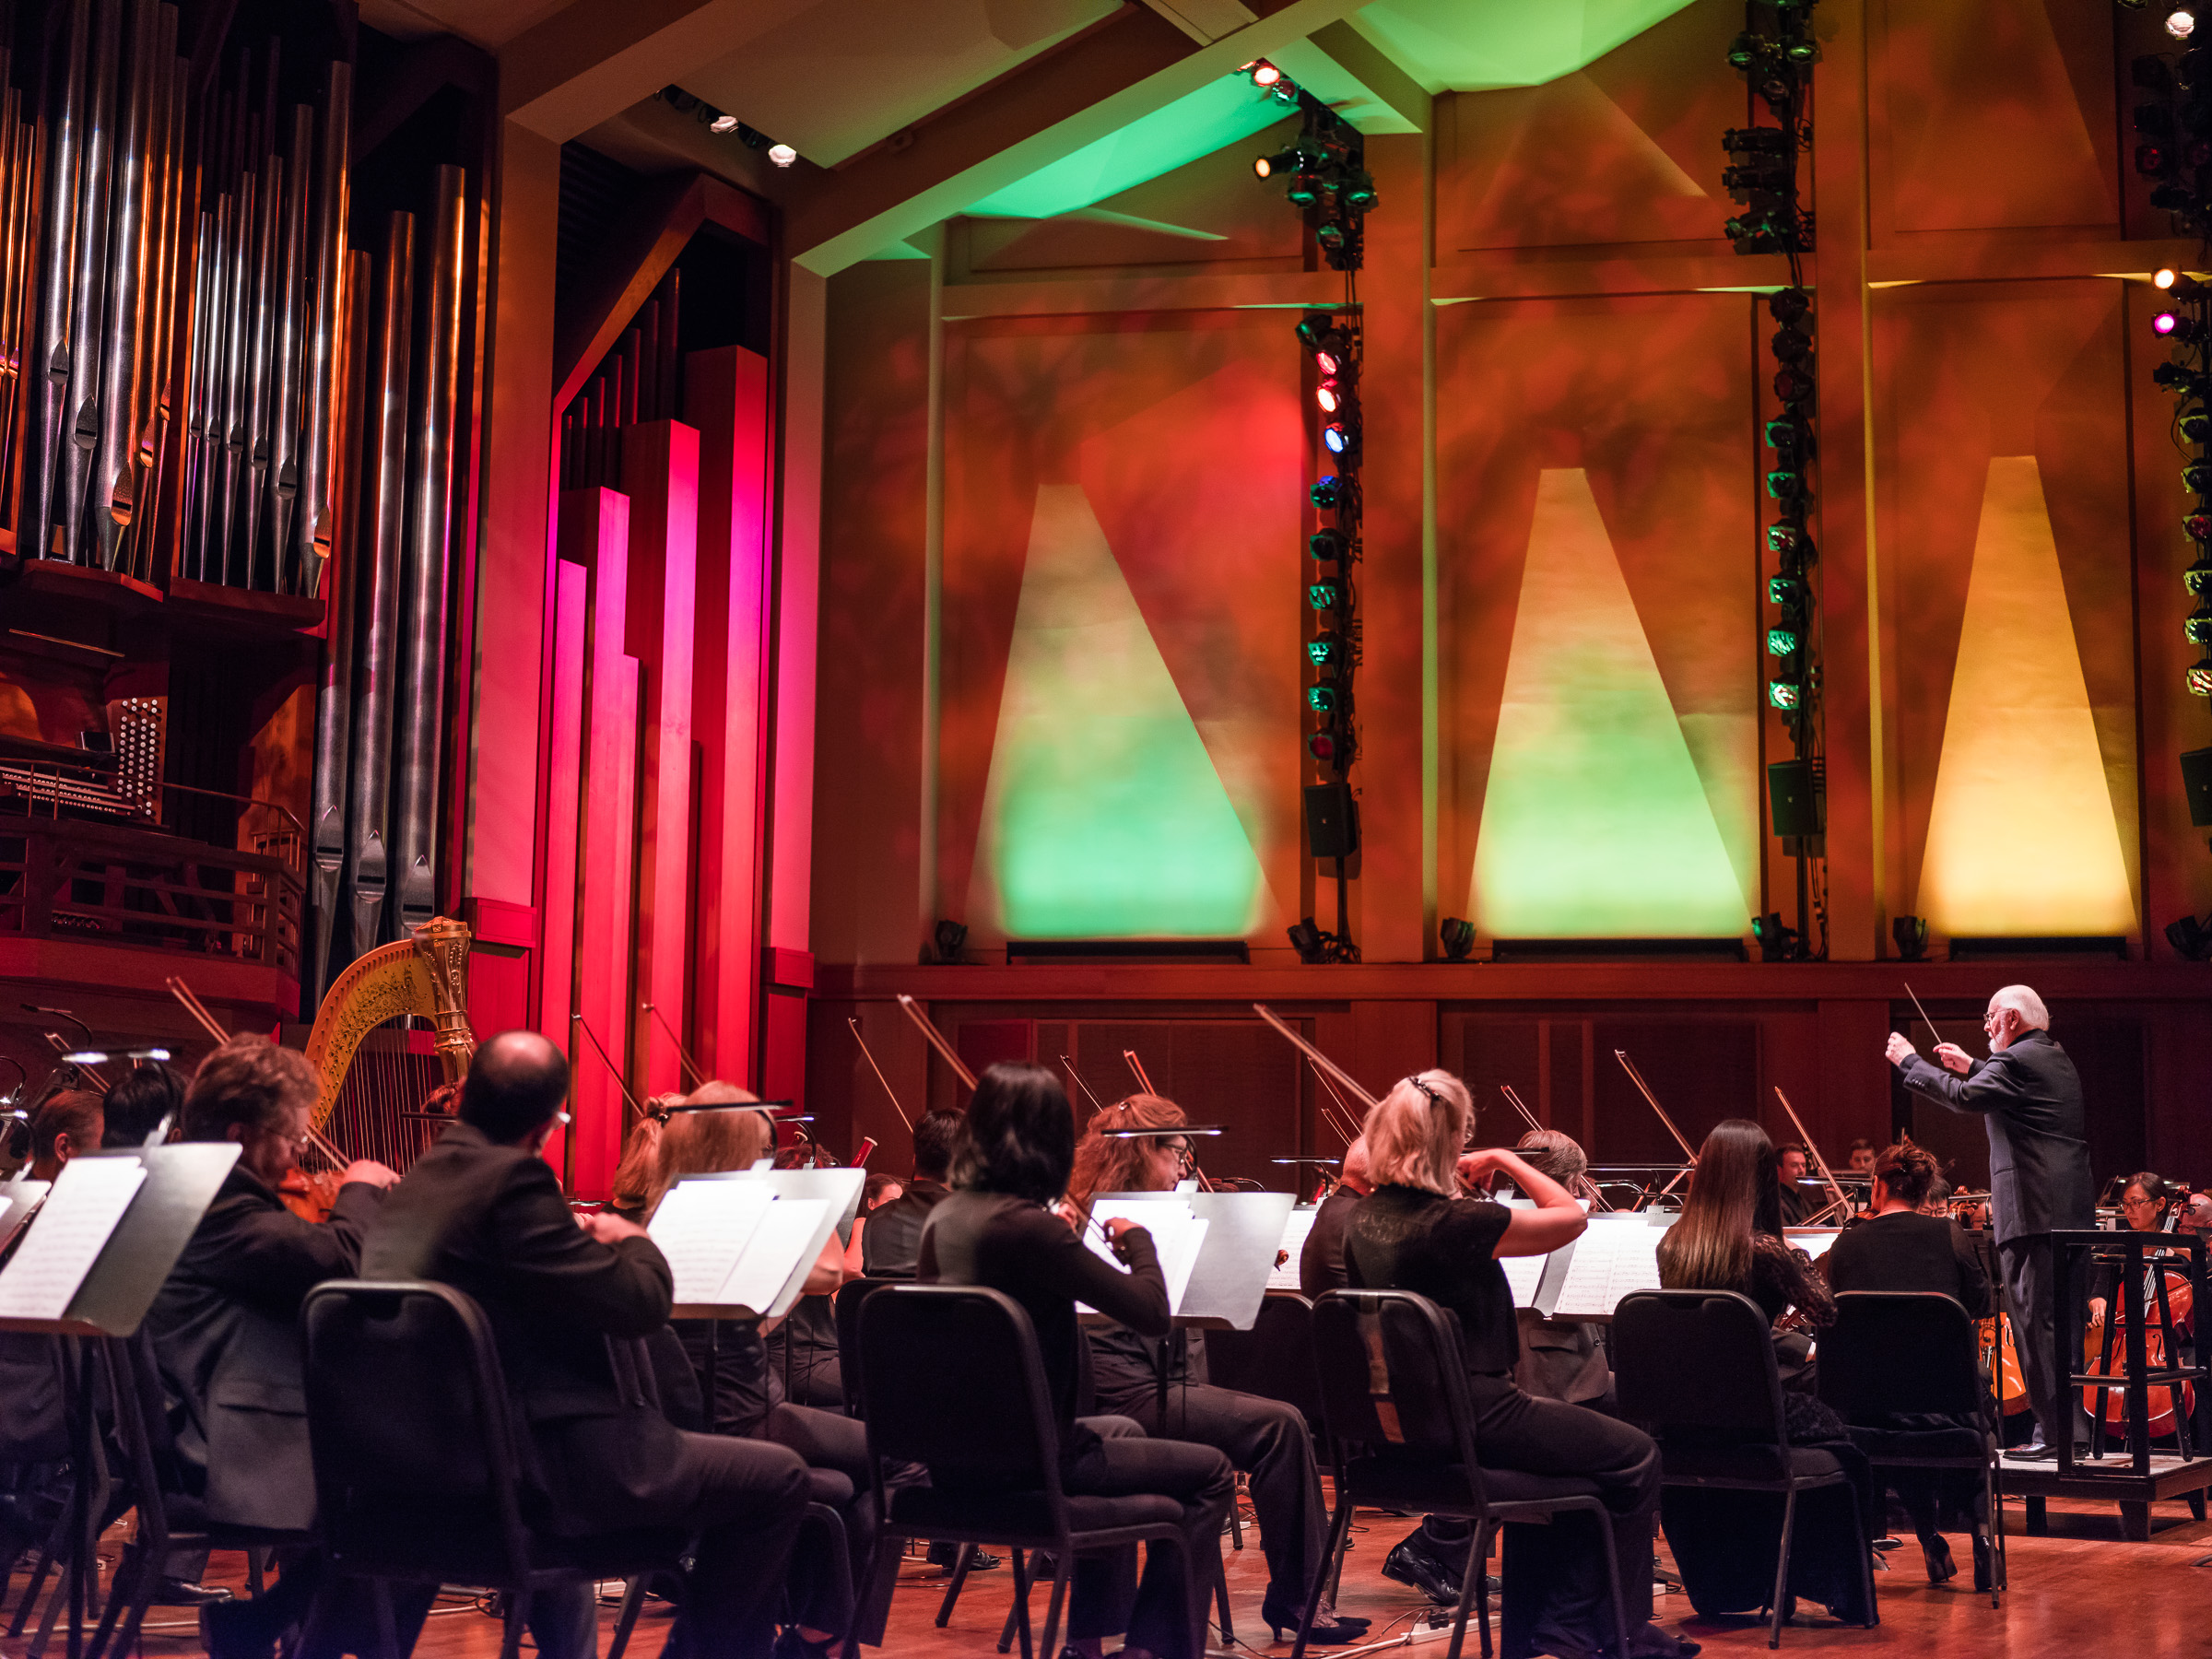 brandon_patoc_john_williams_Steven_Spielberg, Seattle_Symphony_Orchestra_Conert_0052.JPG